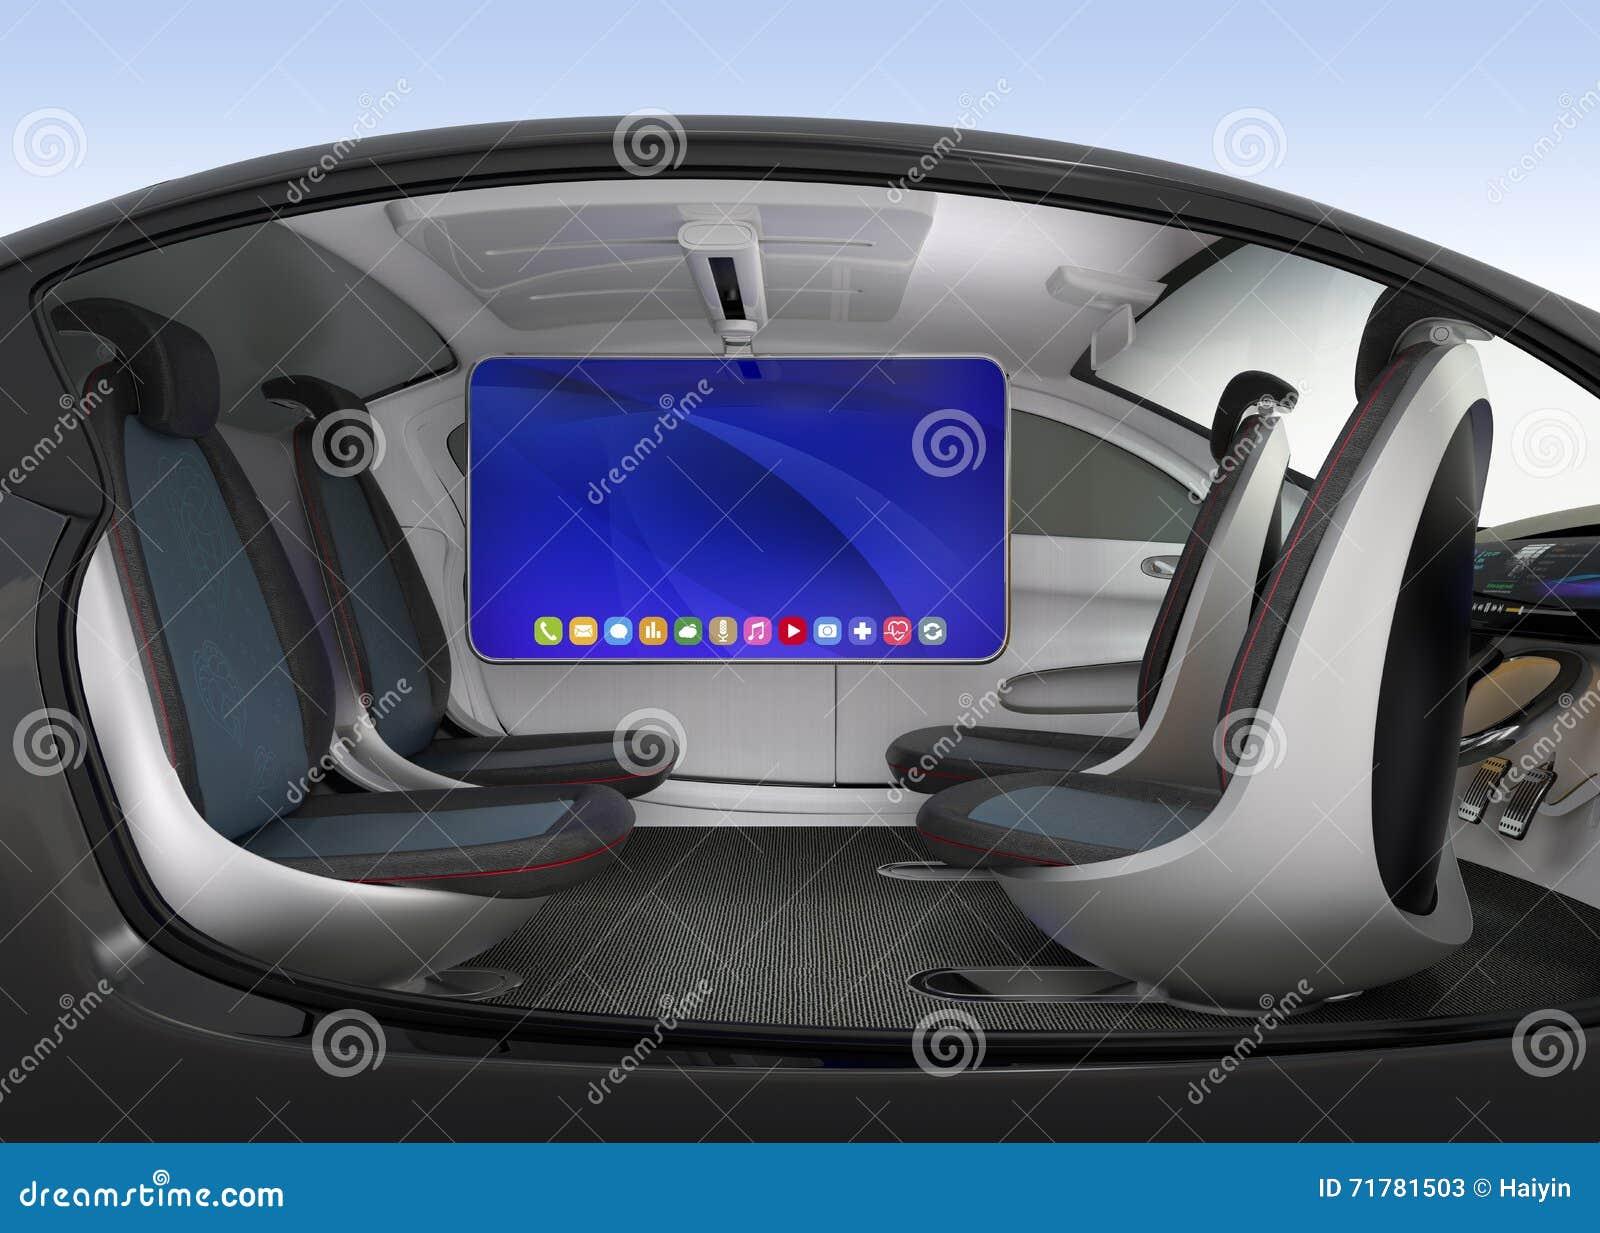 autonomous car interior concept stock illustration image 71781503. Black Bedroom Furniture Sets. Home Design Ideas